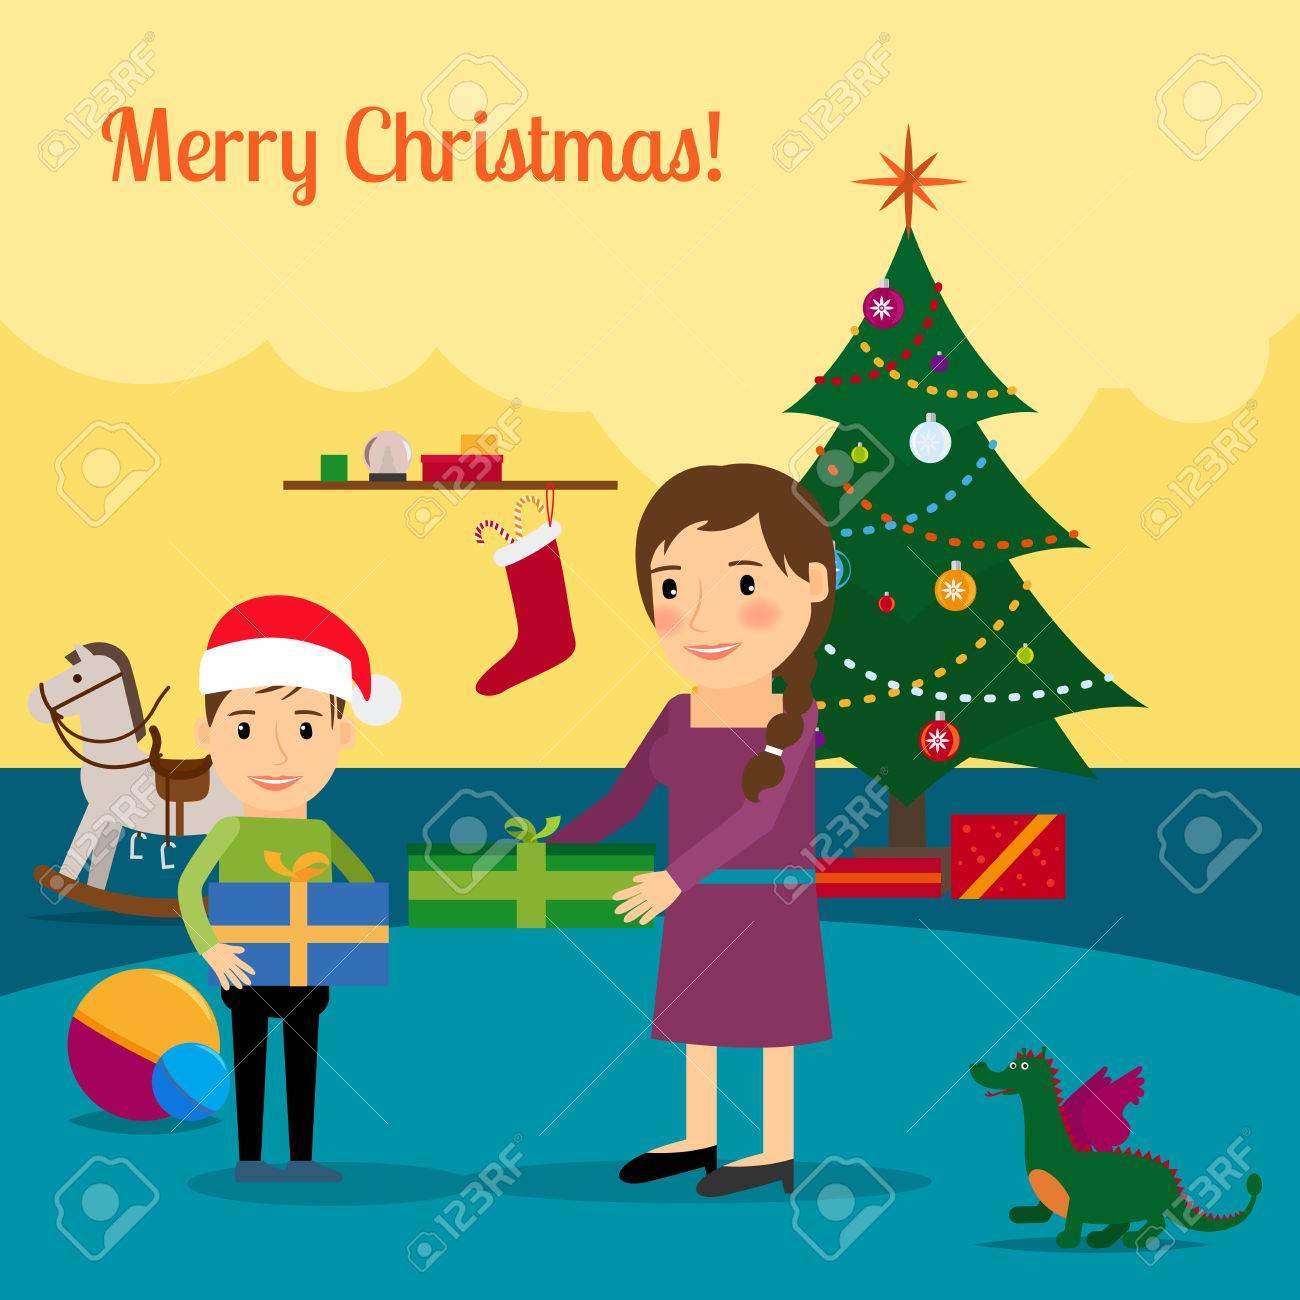 Mother Christmas Cartoon.Merry Christmas Cartoon Illustration With Christmas Tree Mother